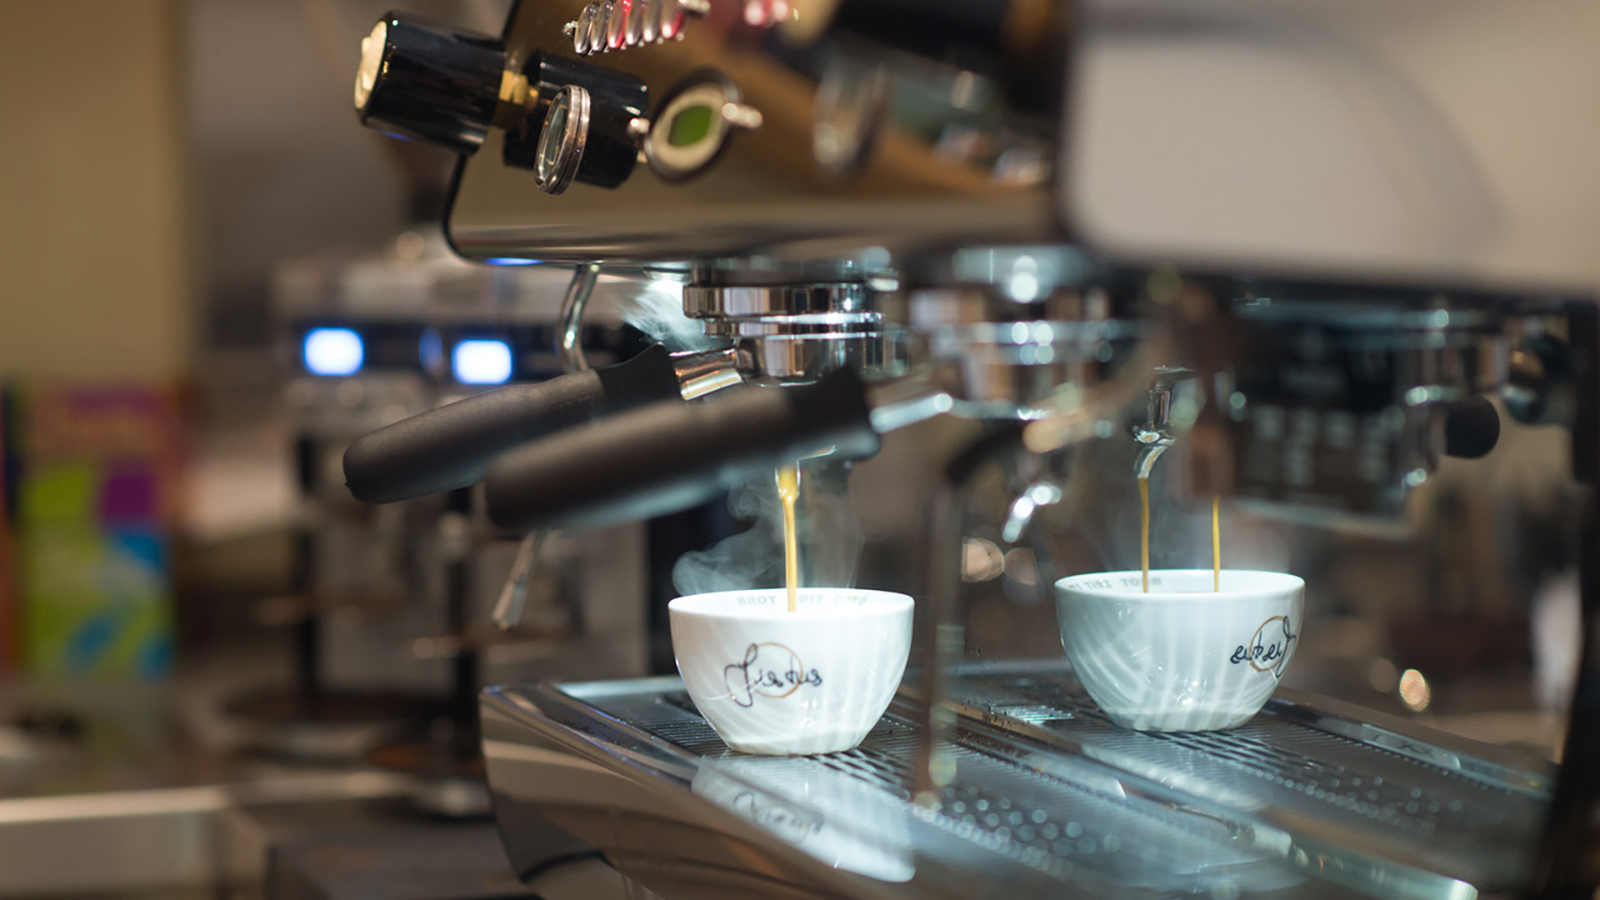 Bild 1 Café Justus